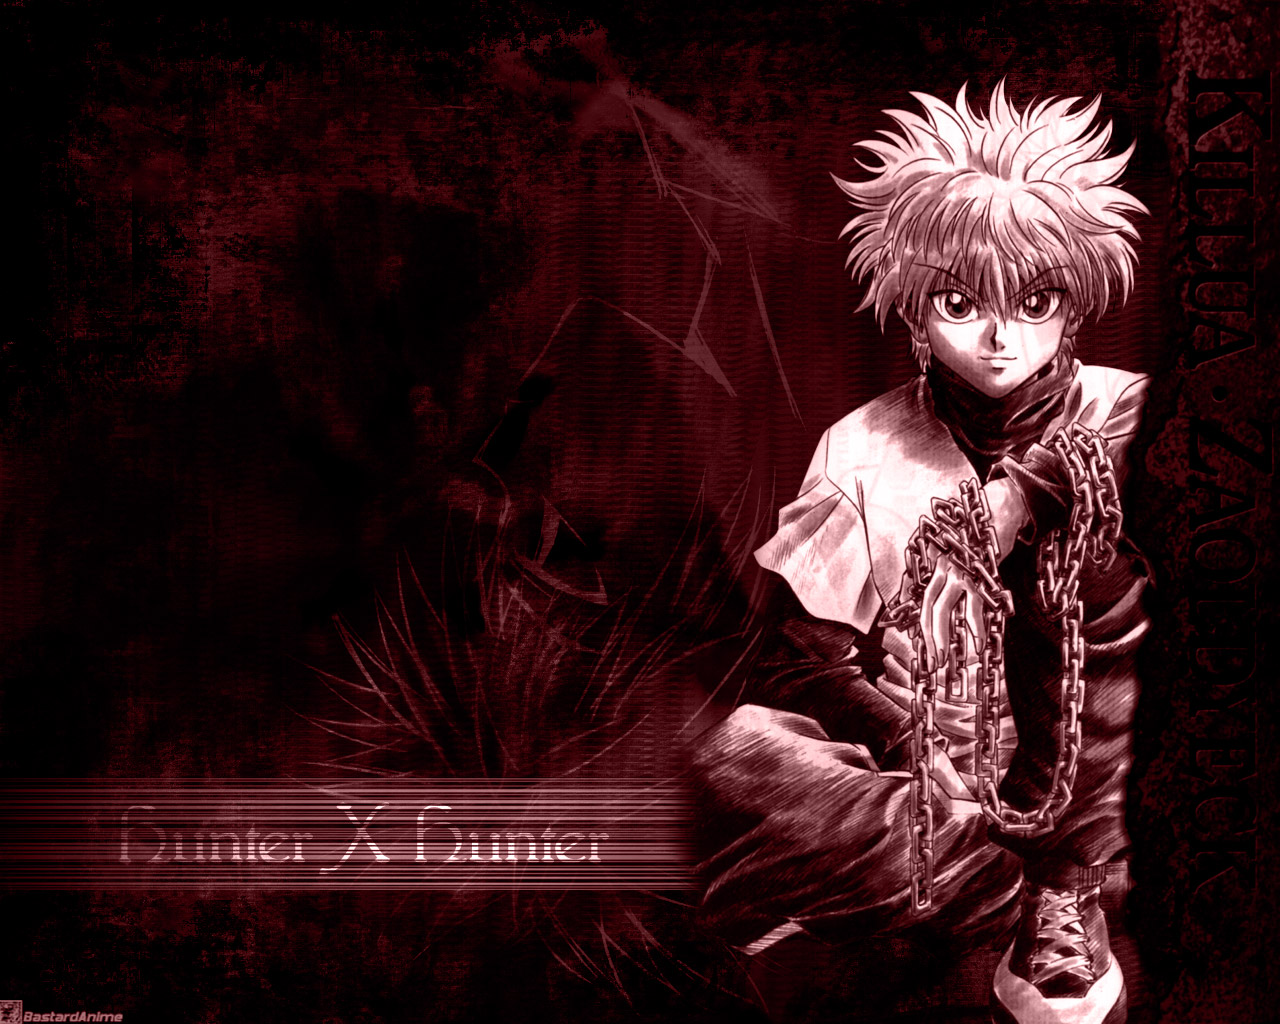 Fonds d'écran Manga Hunter x Hunter killua 02